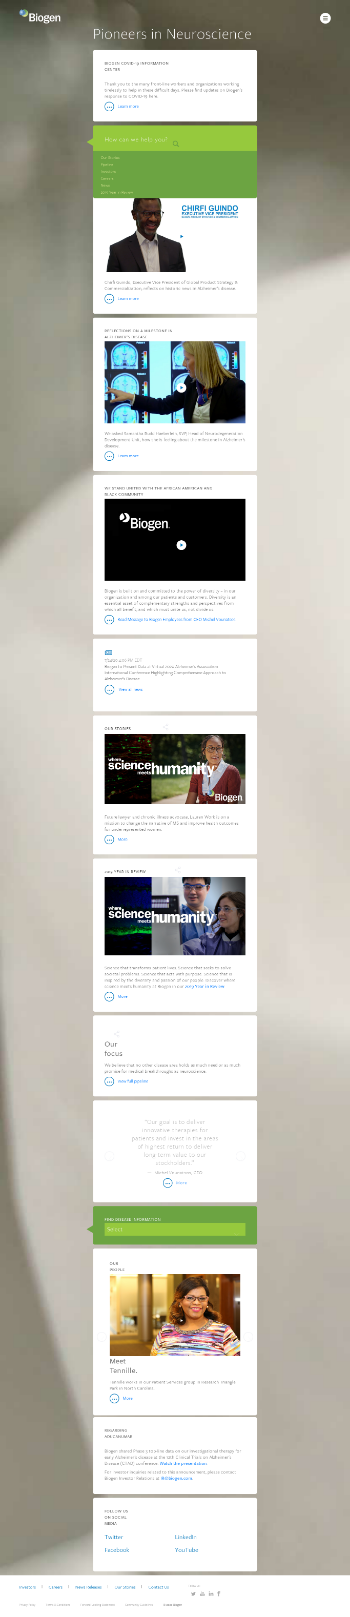 Biogen Inc. Website Screenshot